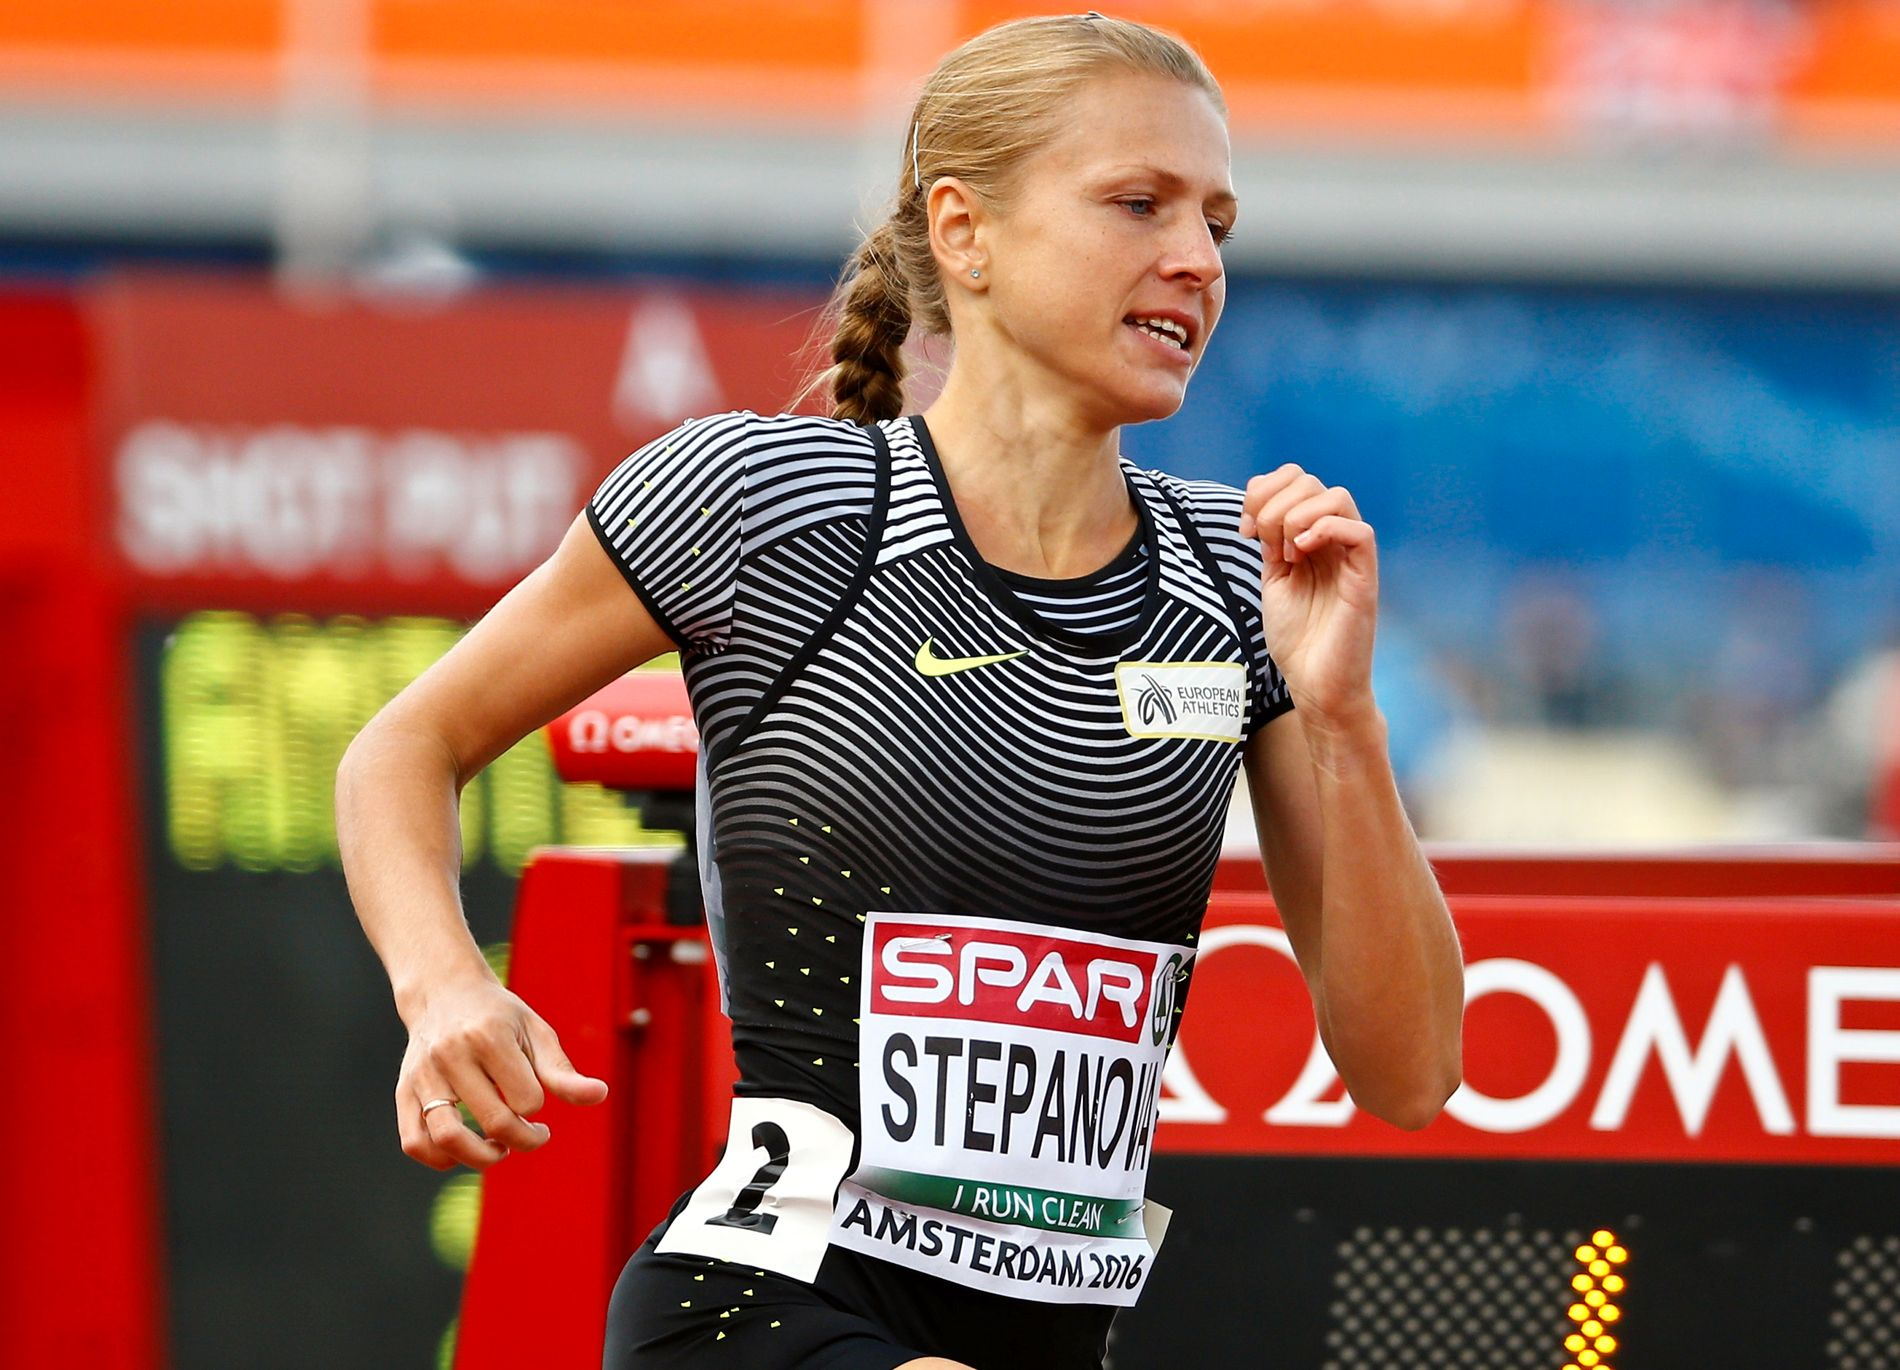 Athletics - European championships - Women's 800m qualifiaction - Amsterdam - 6/7/16 Yulia Stepanova of Russia competes. REUTERS/Michael Kooren/File Photo